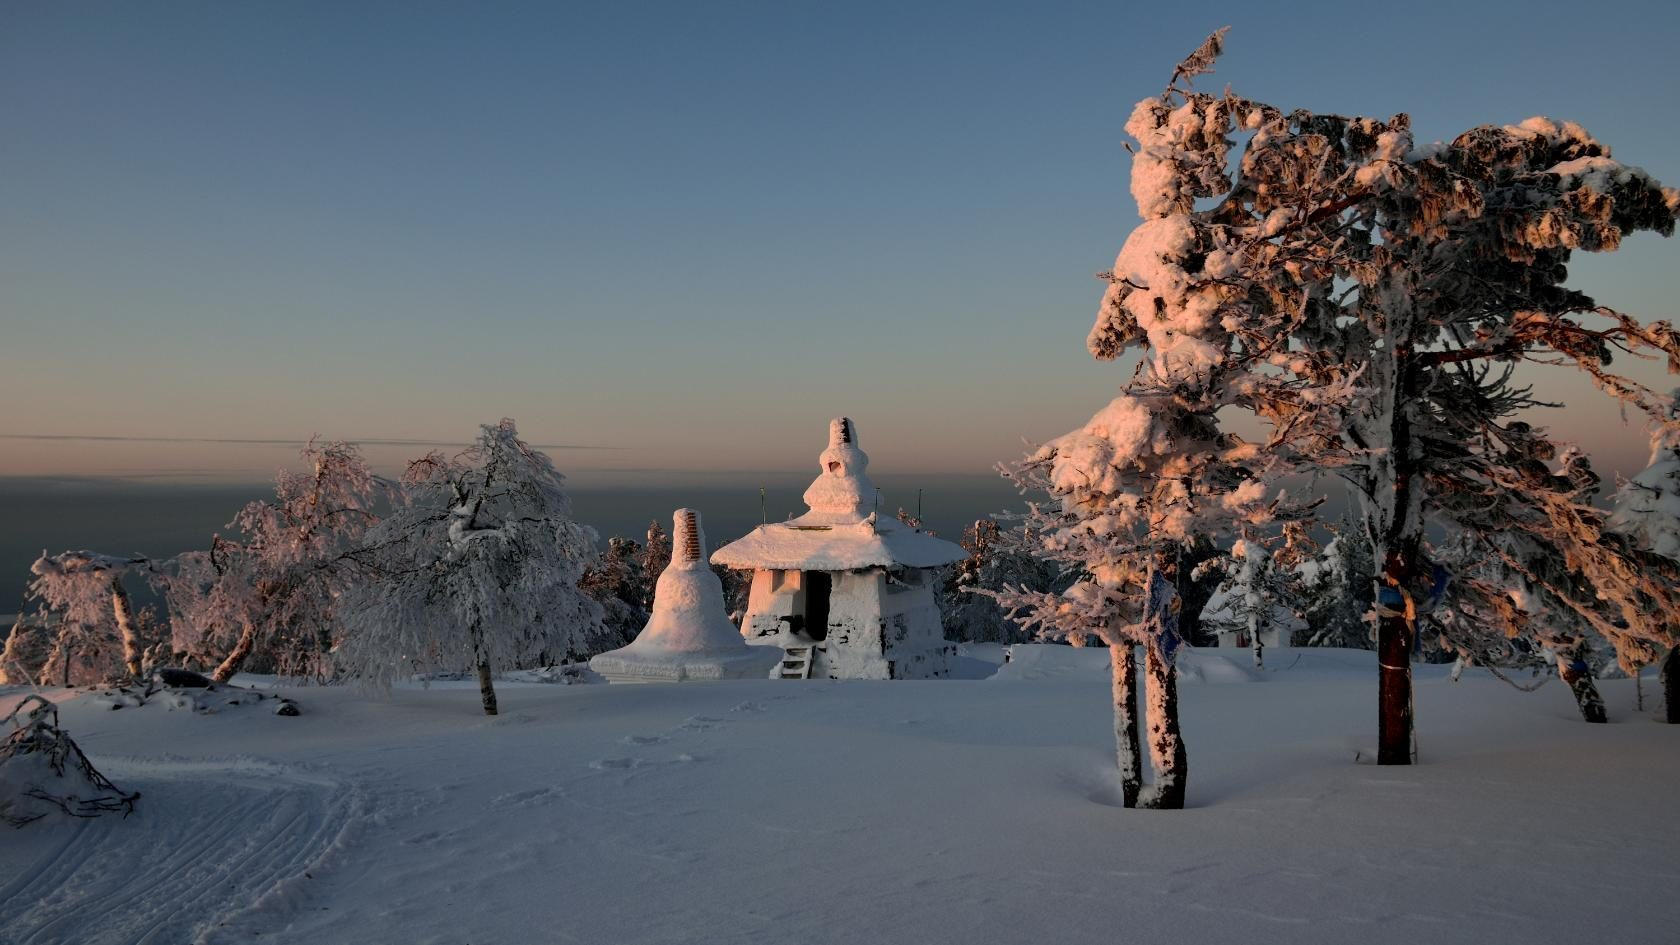 Буддийский монастырь Шад-Тчуп-Линг в Качканаре. Фото Вадима Баталова